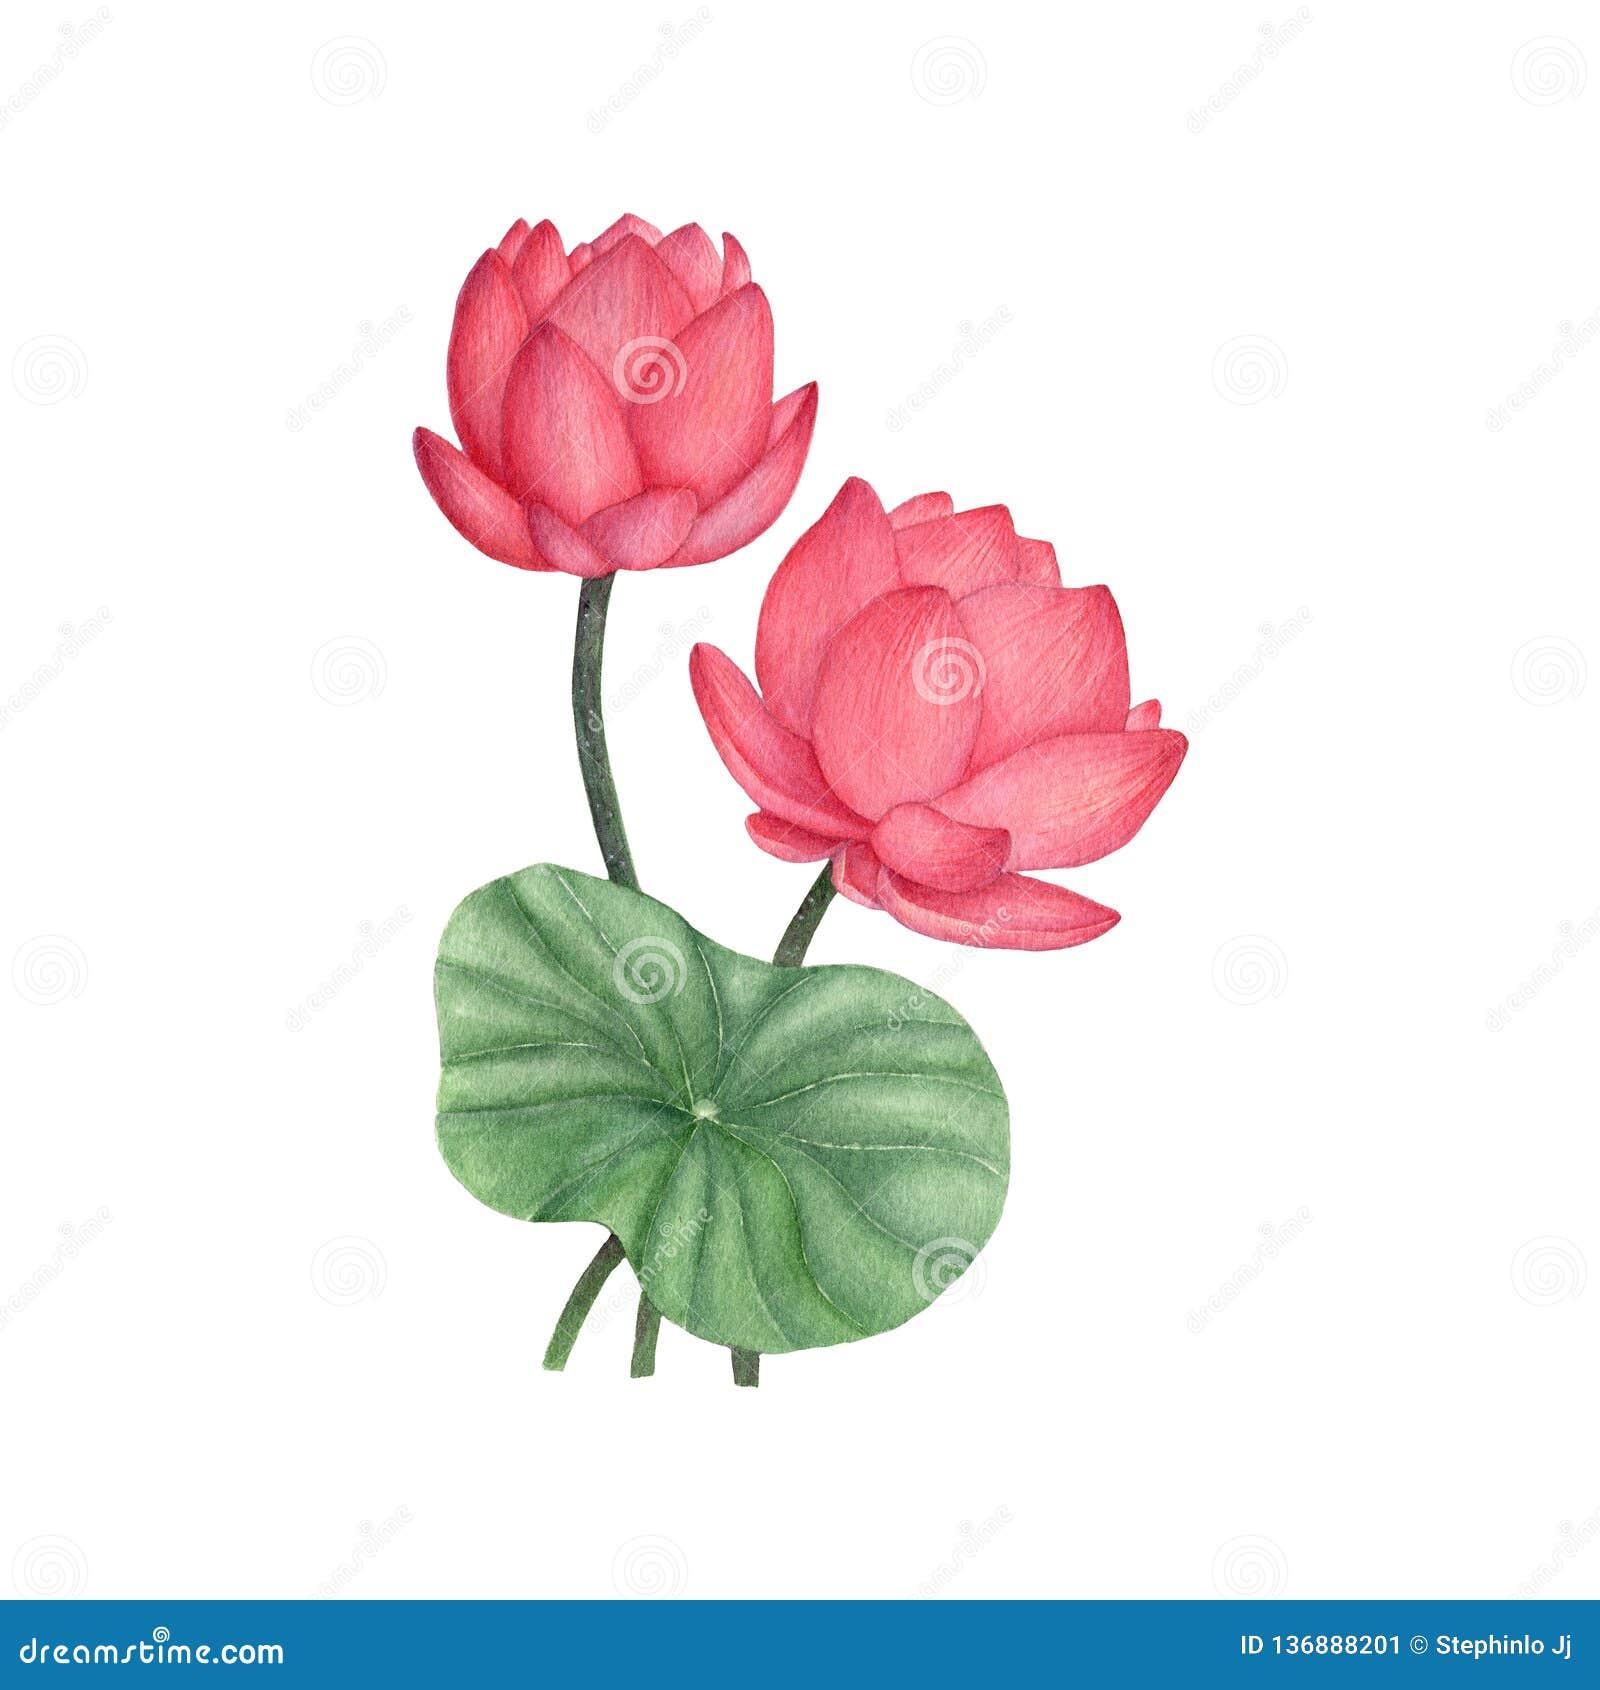 Lotus Flower Illustration Watercolor Paintingwatercolor Hand